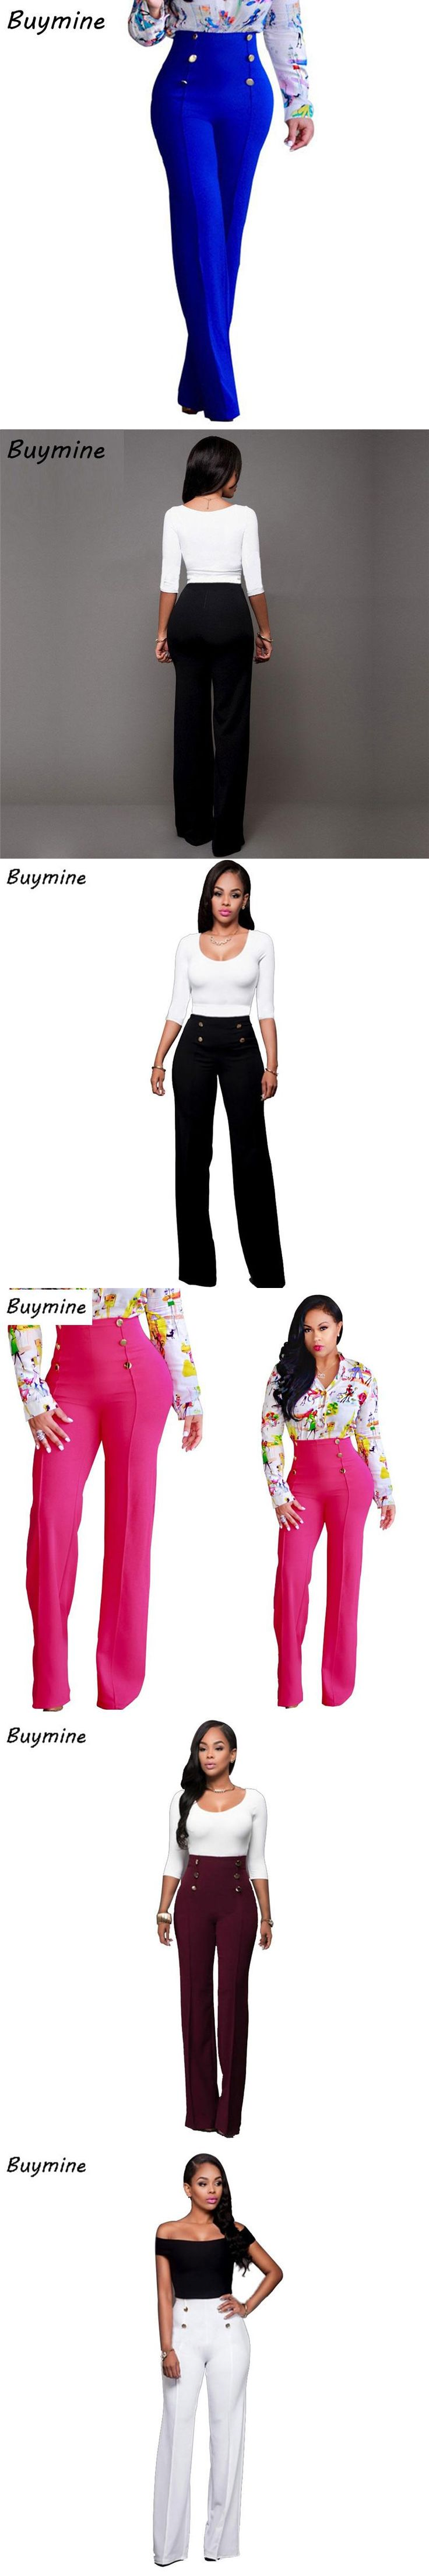 Fashion Flare Pants Women 2017 High Waist Black Trousers Front Button Brief Ladies Pants OL Elegant Pants Summer Pencil Trousers